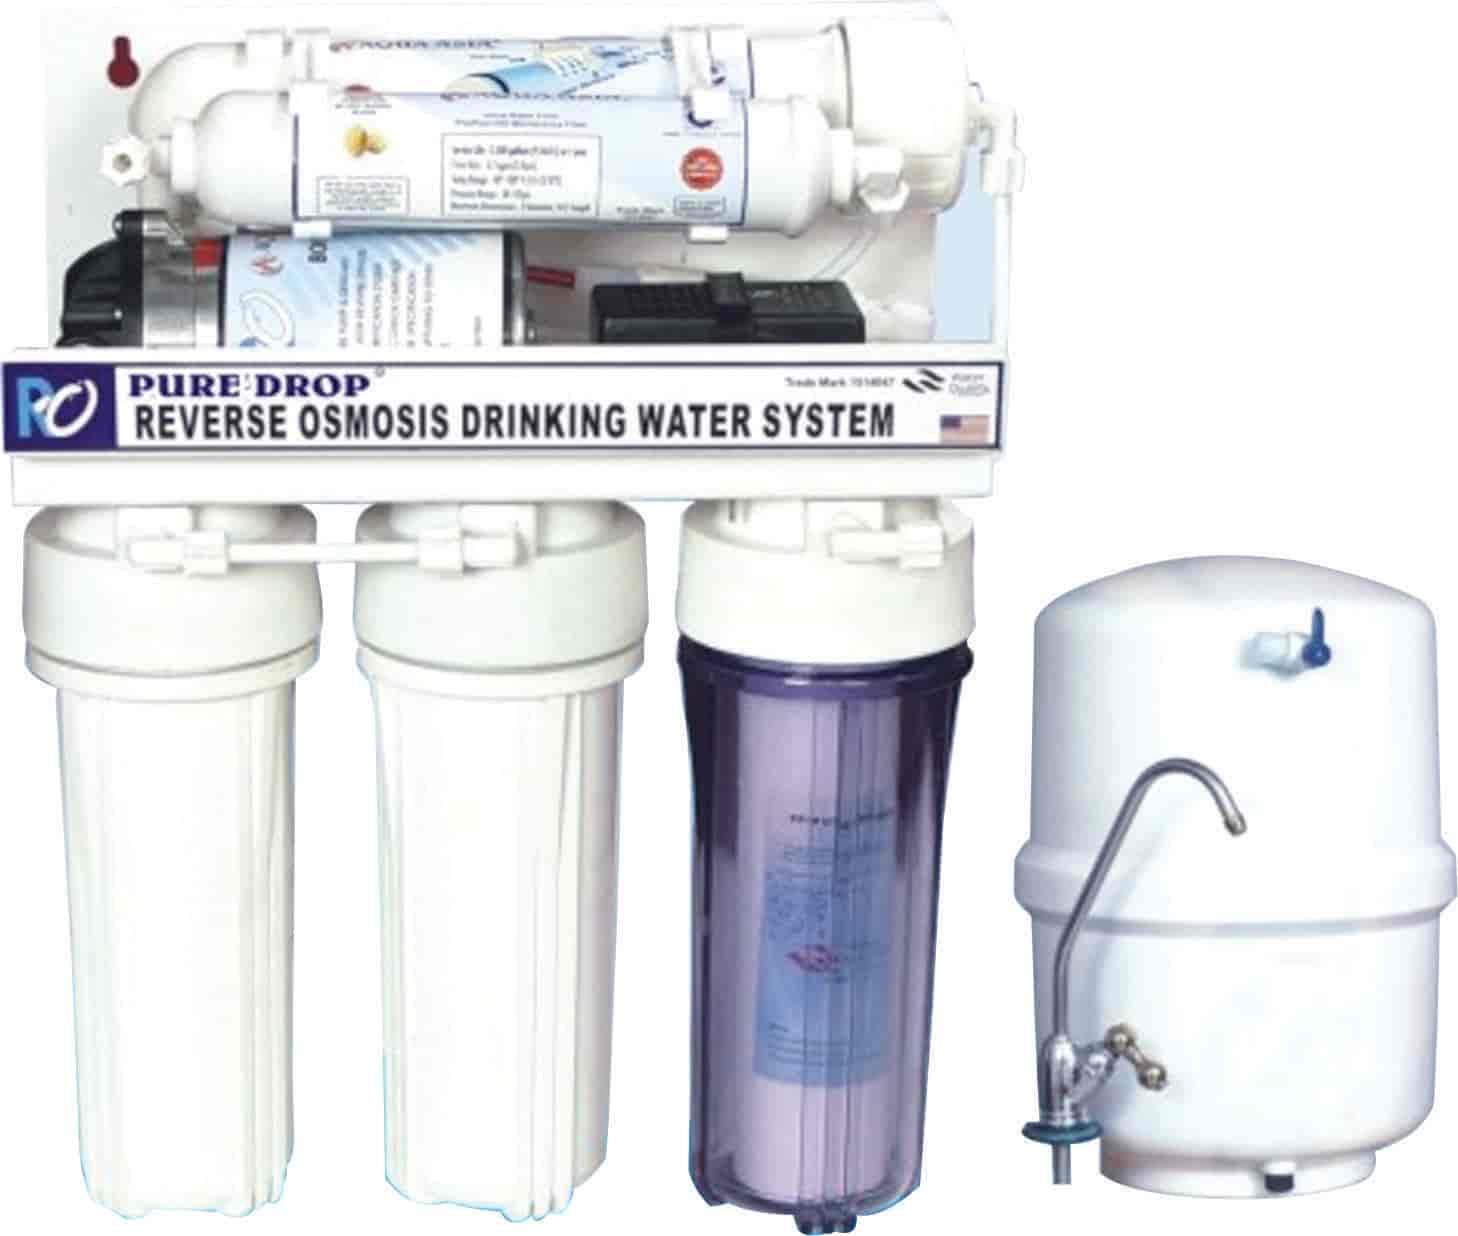 479930818a Spectrum Aqua Pvt. Ltd., Pandav Nagar - Ro Water Purifier Repair & Services  in Delhi - Justdial